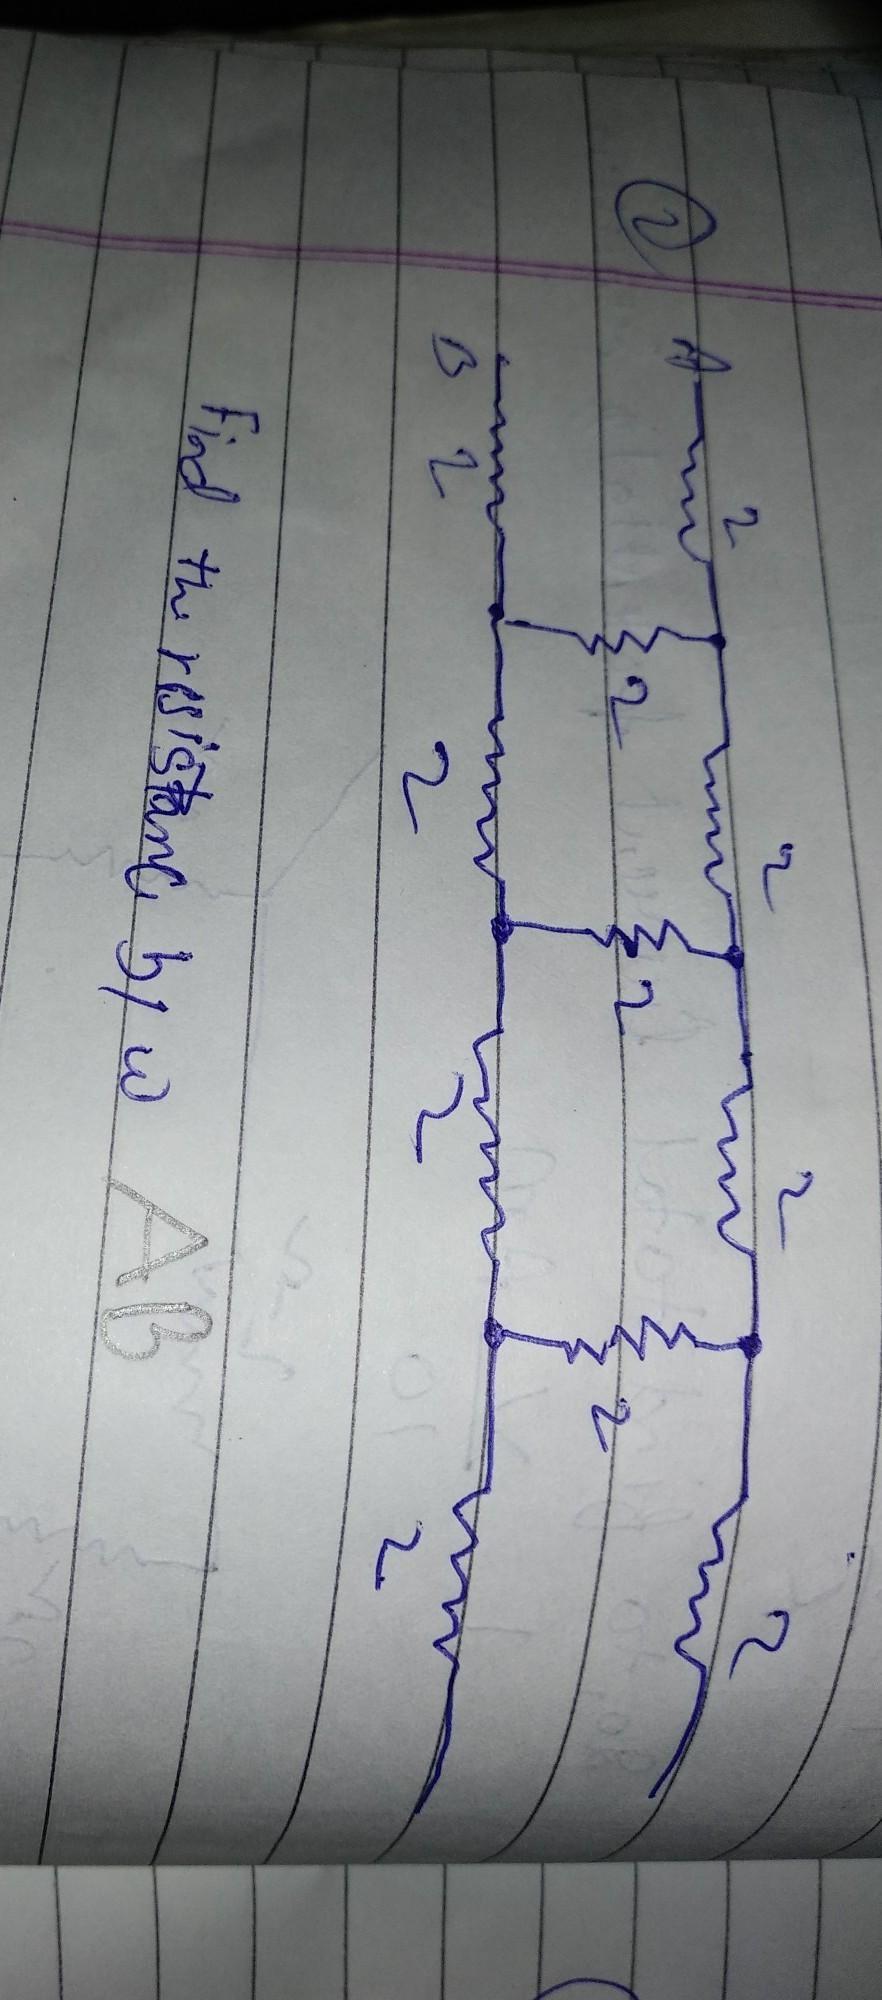 find the resistance between ab please please help me fast copy par